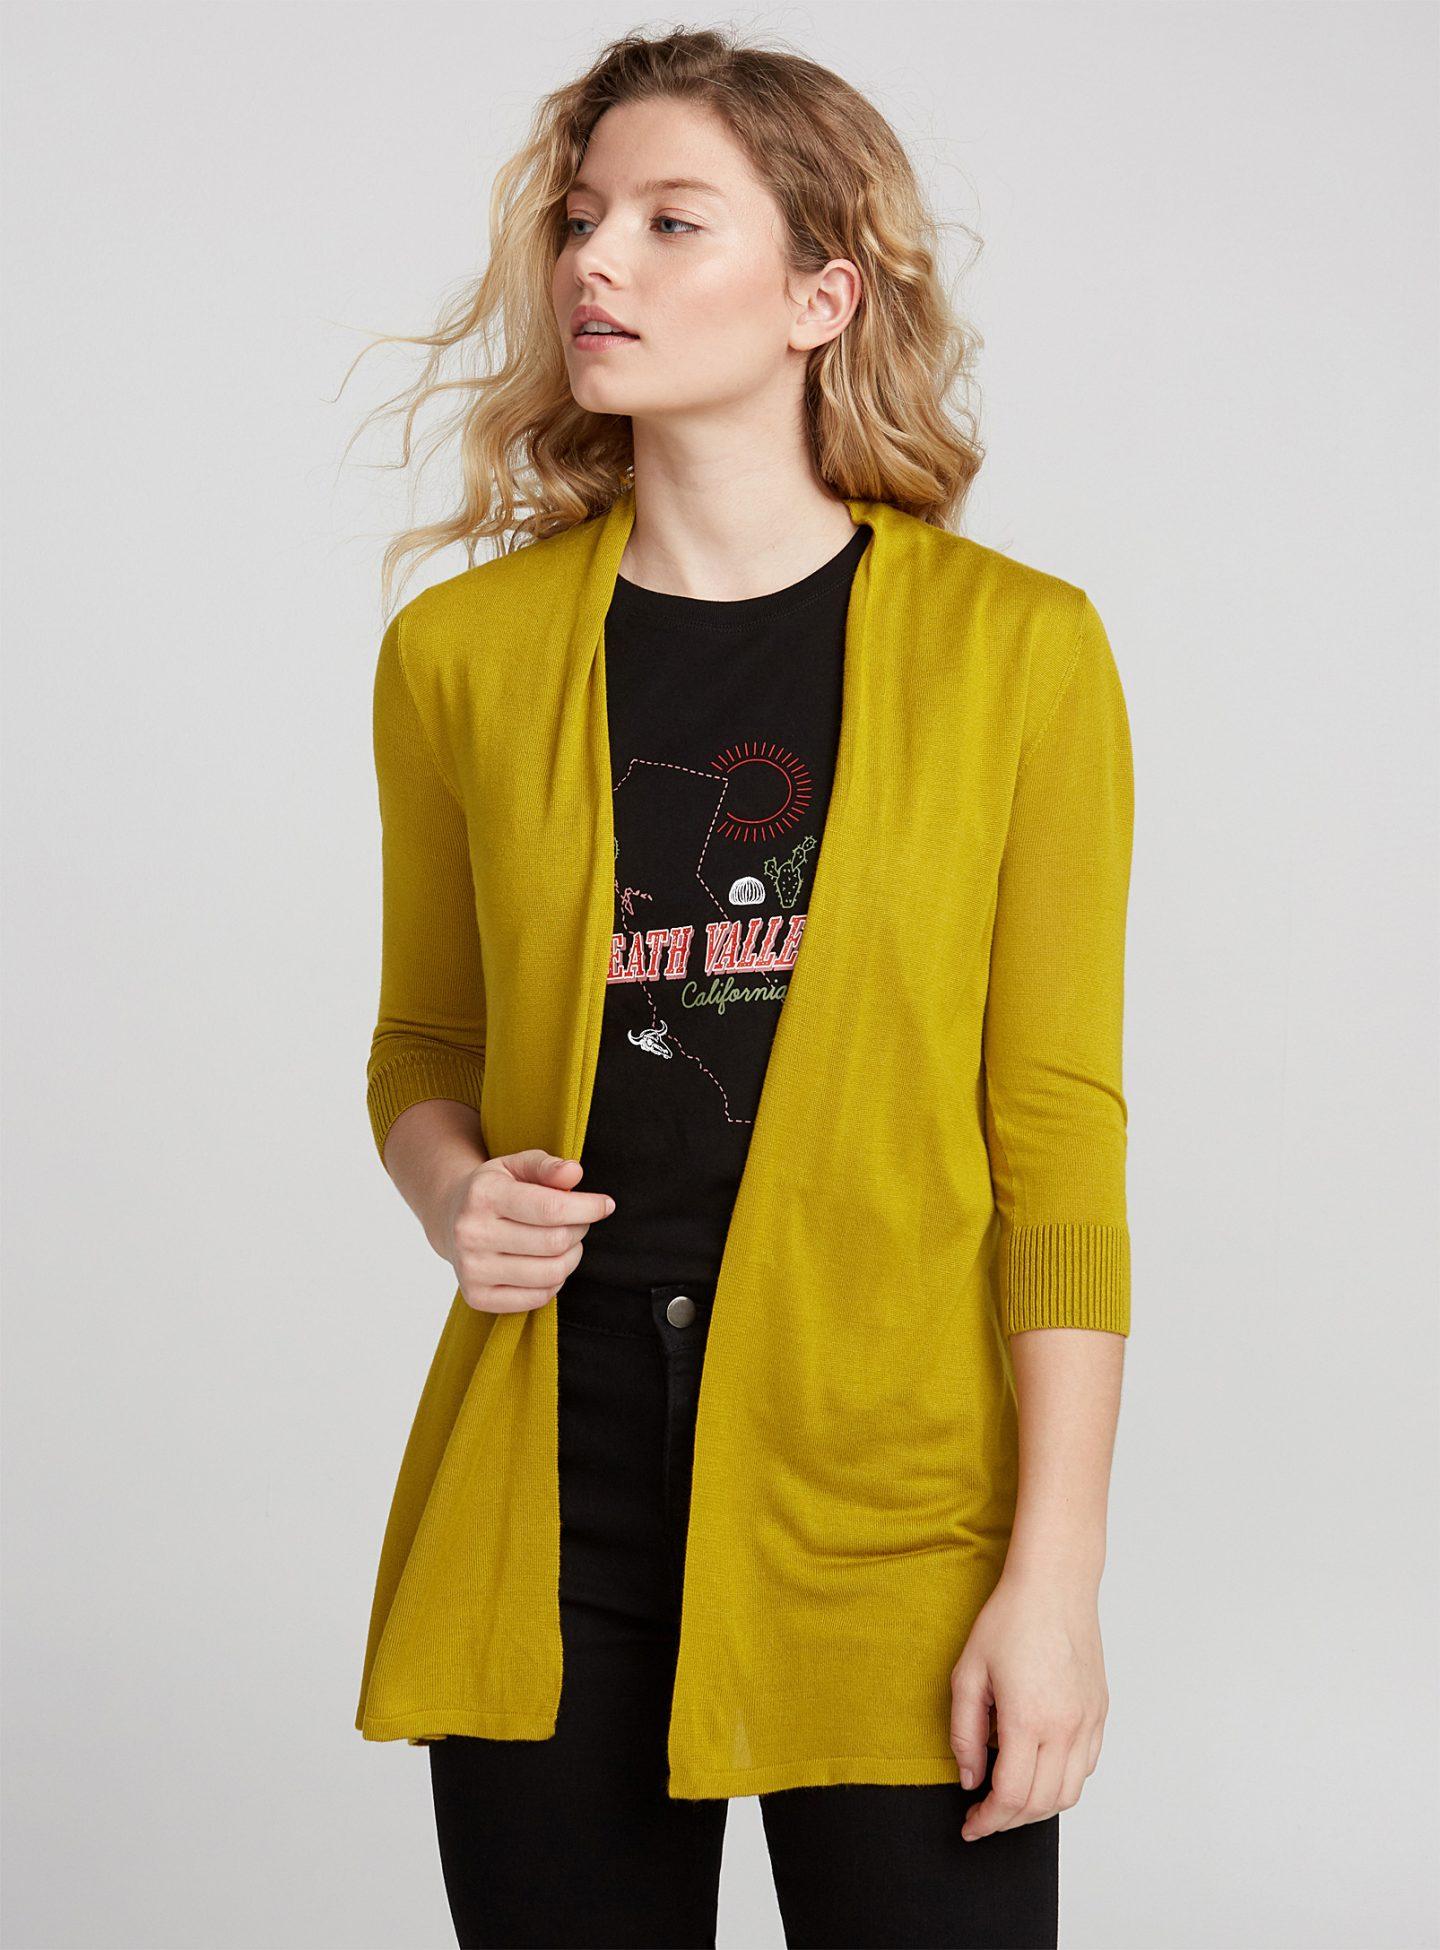 Porter la veste jaune